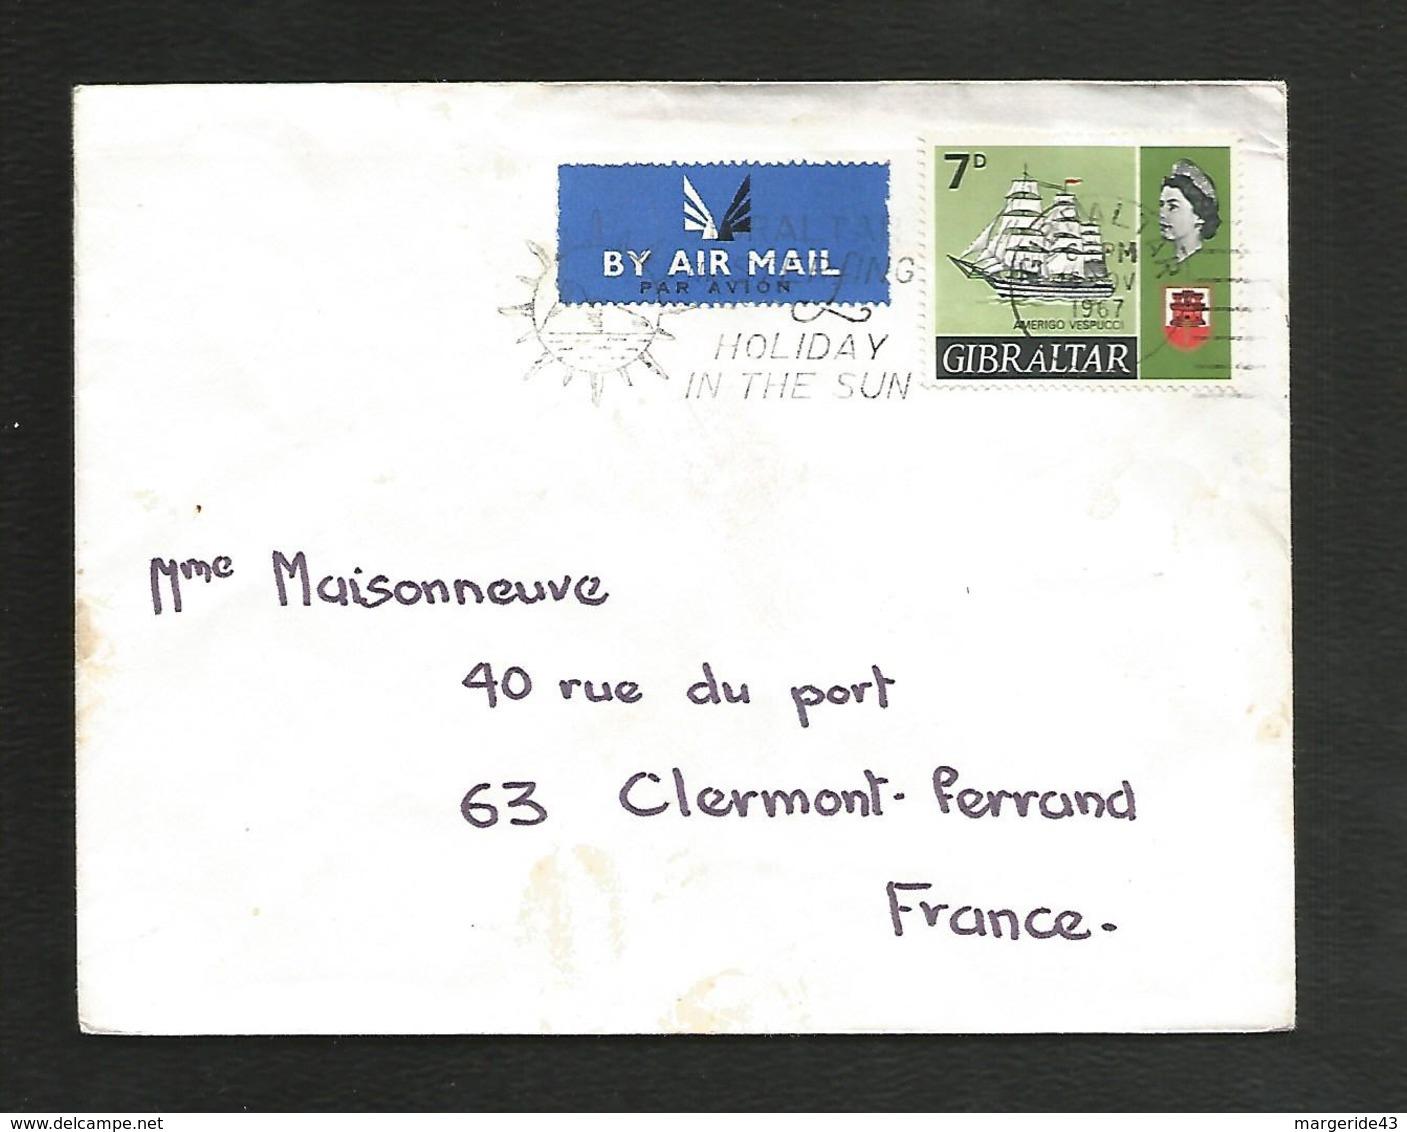 GIBRALTAR LETTRE AVION POUR LA FRANCE 1967 - Gibraltar